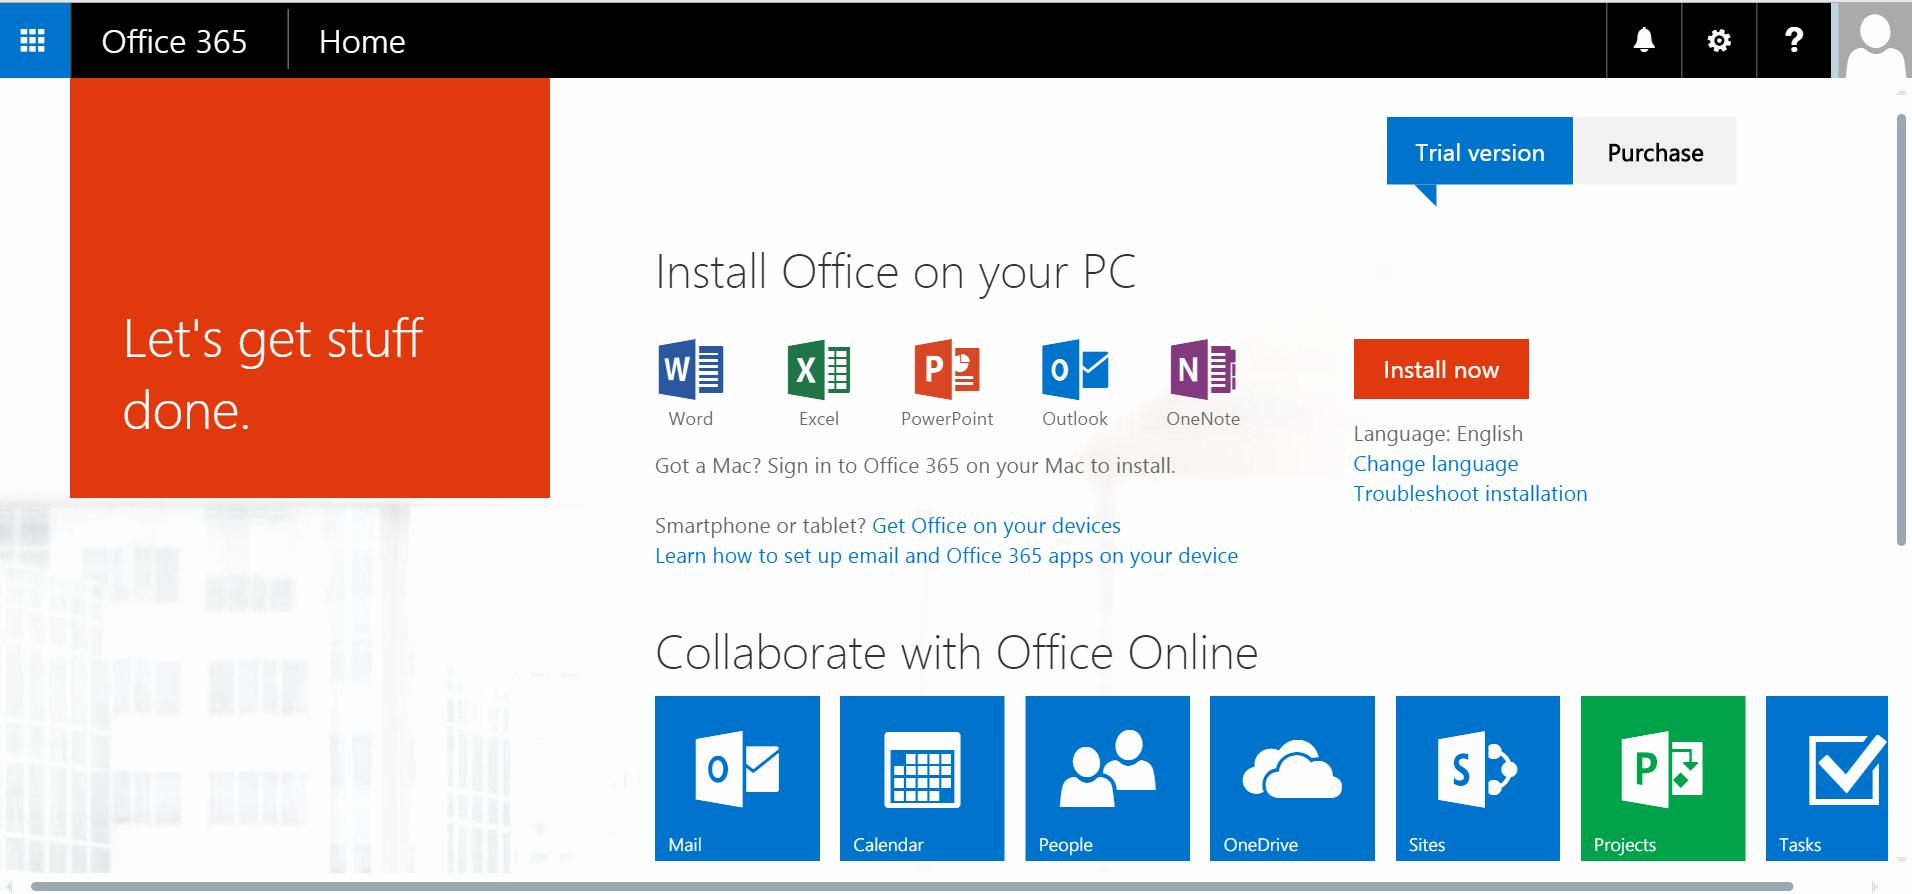 Office 365 Email Login Portal Inspirational Fice 365 Login Portal